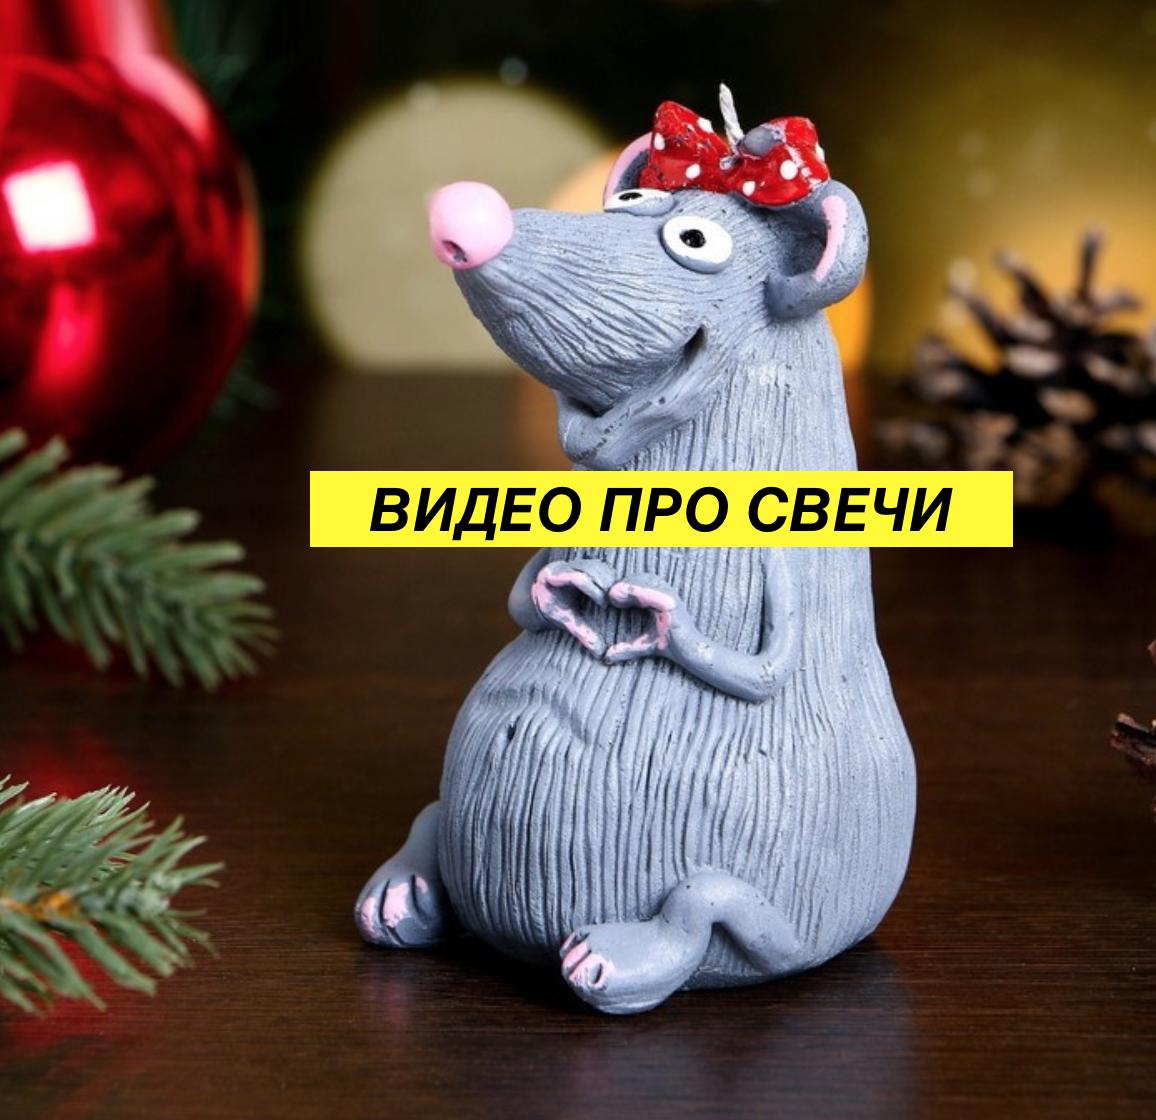 Сувенир на Новый год 2020 - Свеча в форме Мышки, Кусочка Сыра, Шишки, Мандарина, Ёлочки